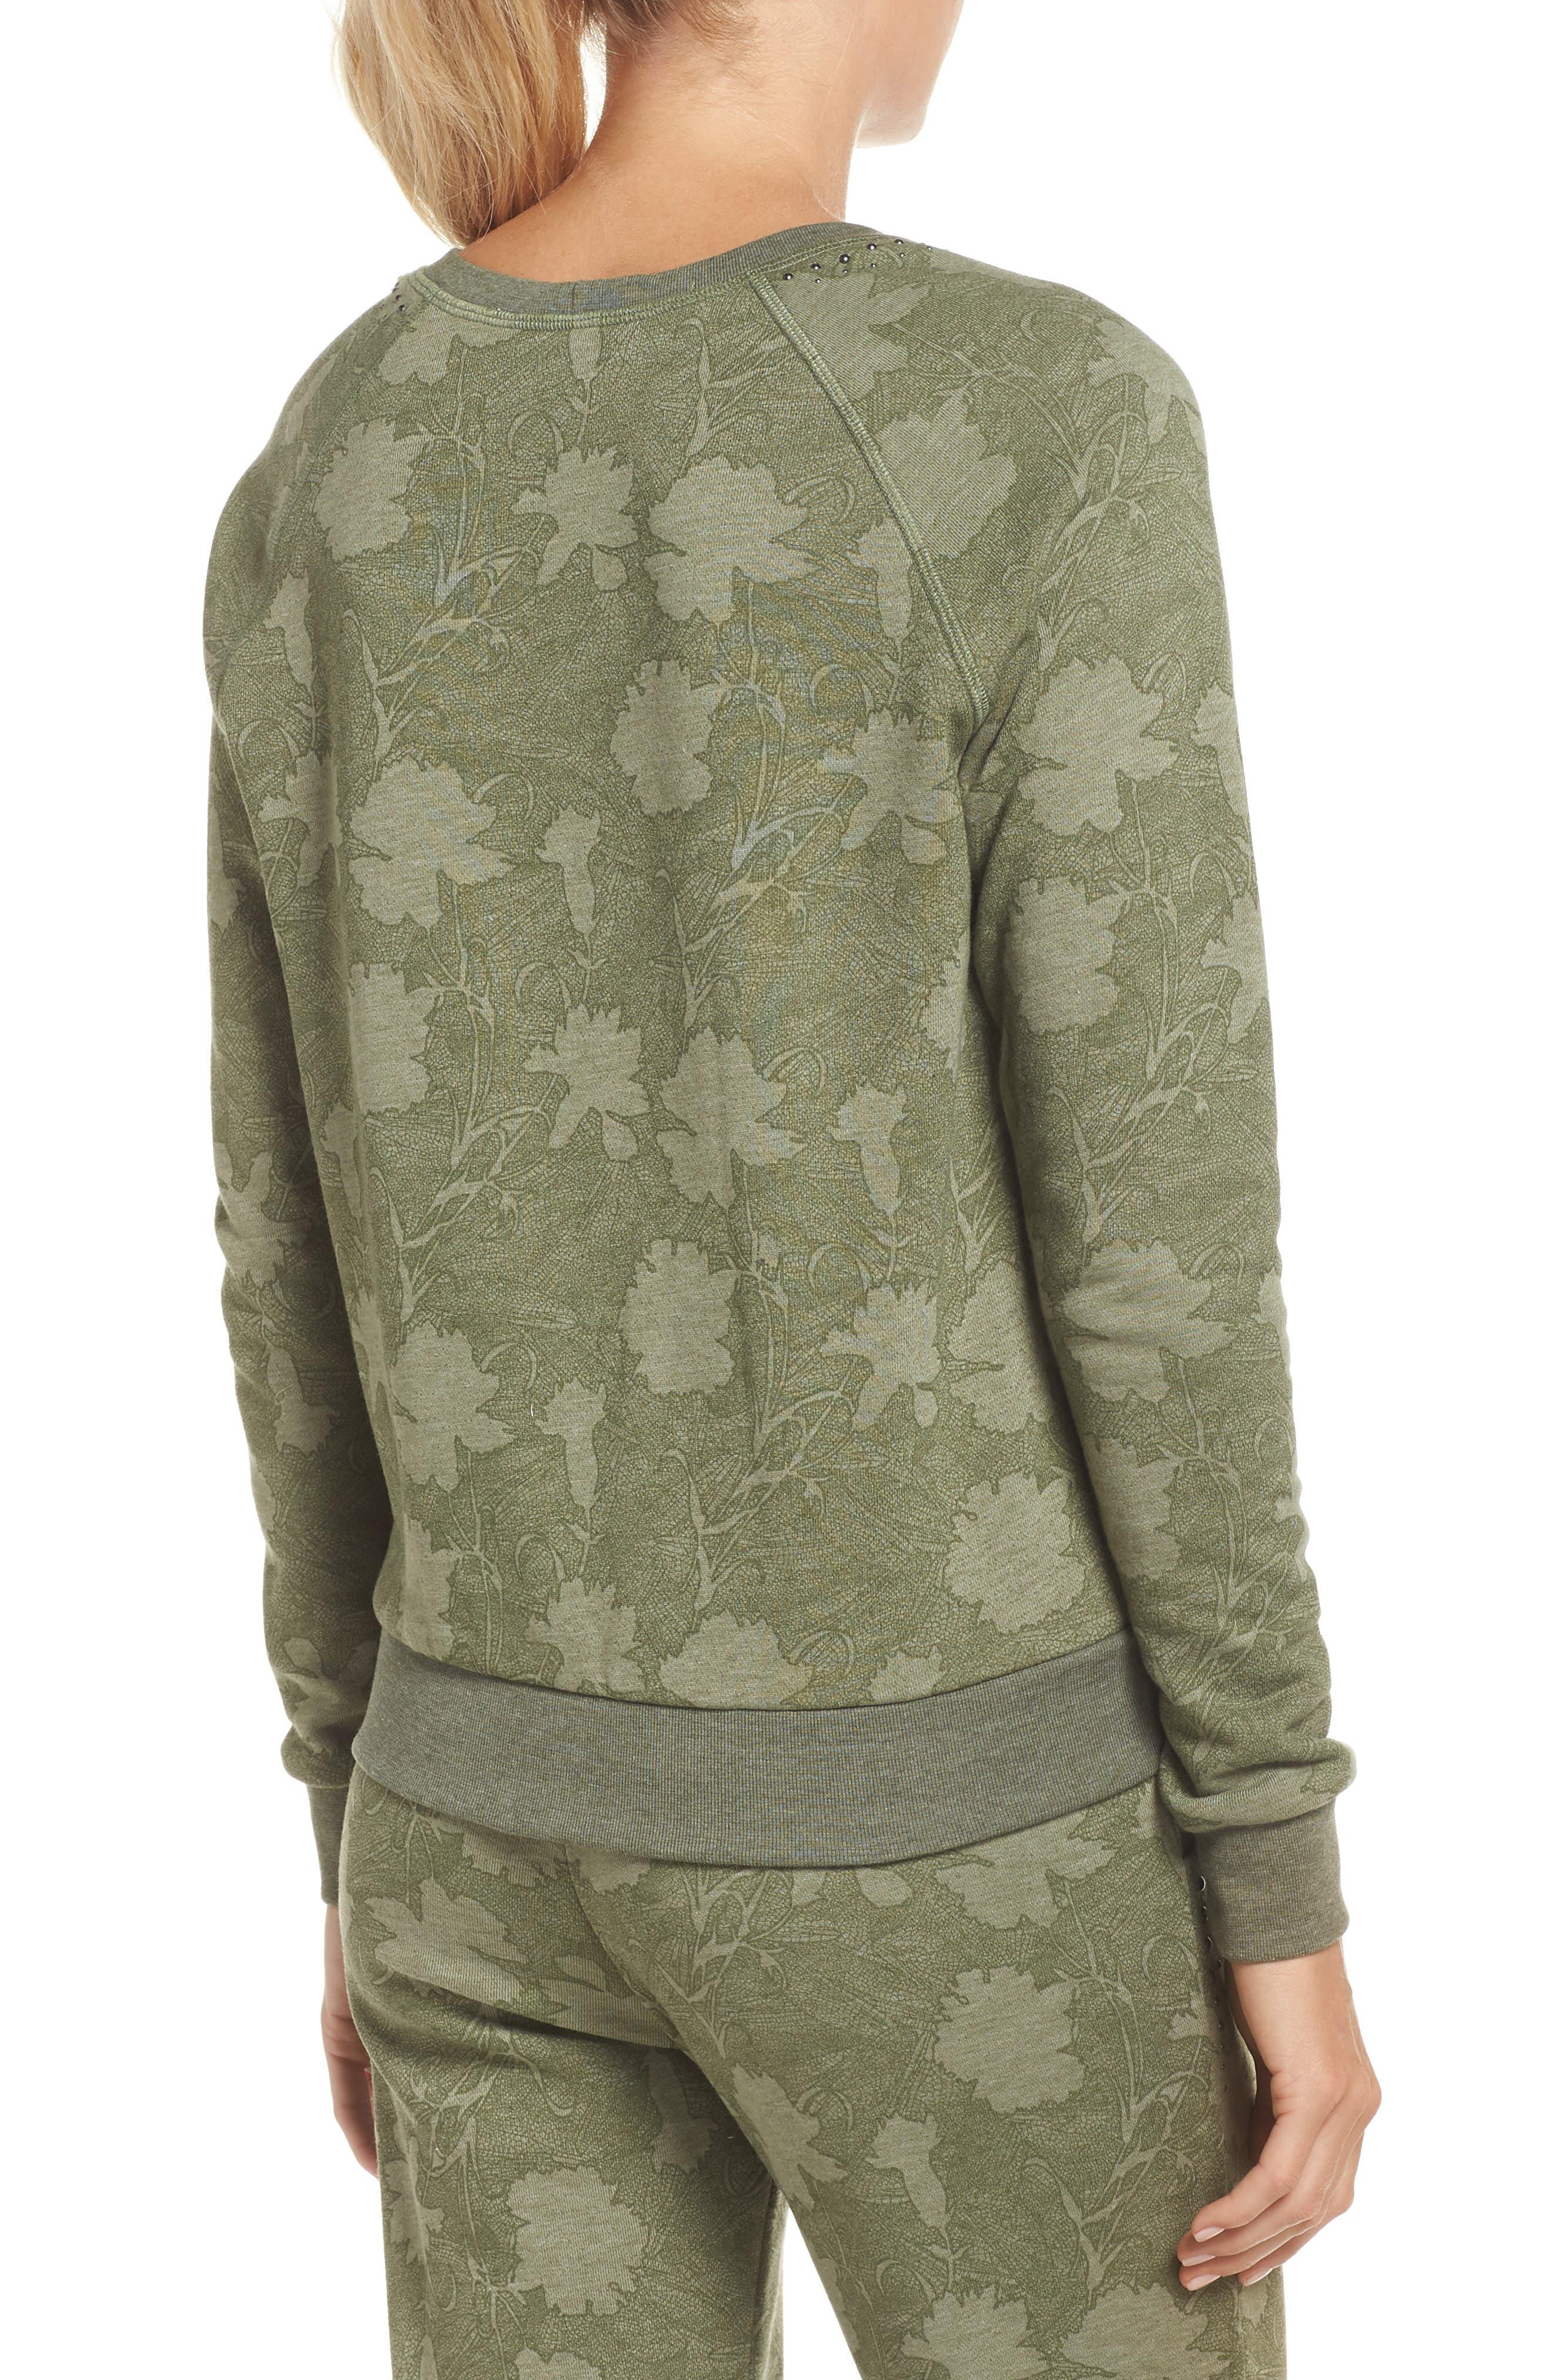 Sleek Leaf Kale Sweatshirt,                             Alternate thumbnail 2, color,                             GREEN